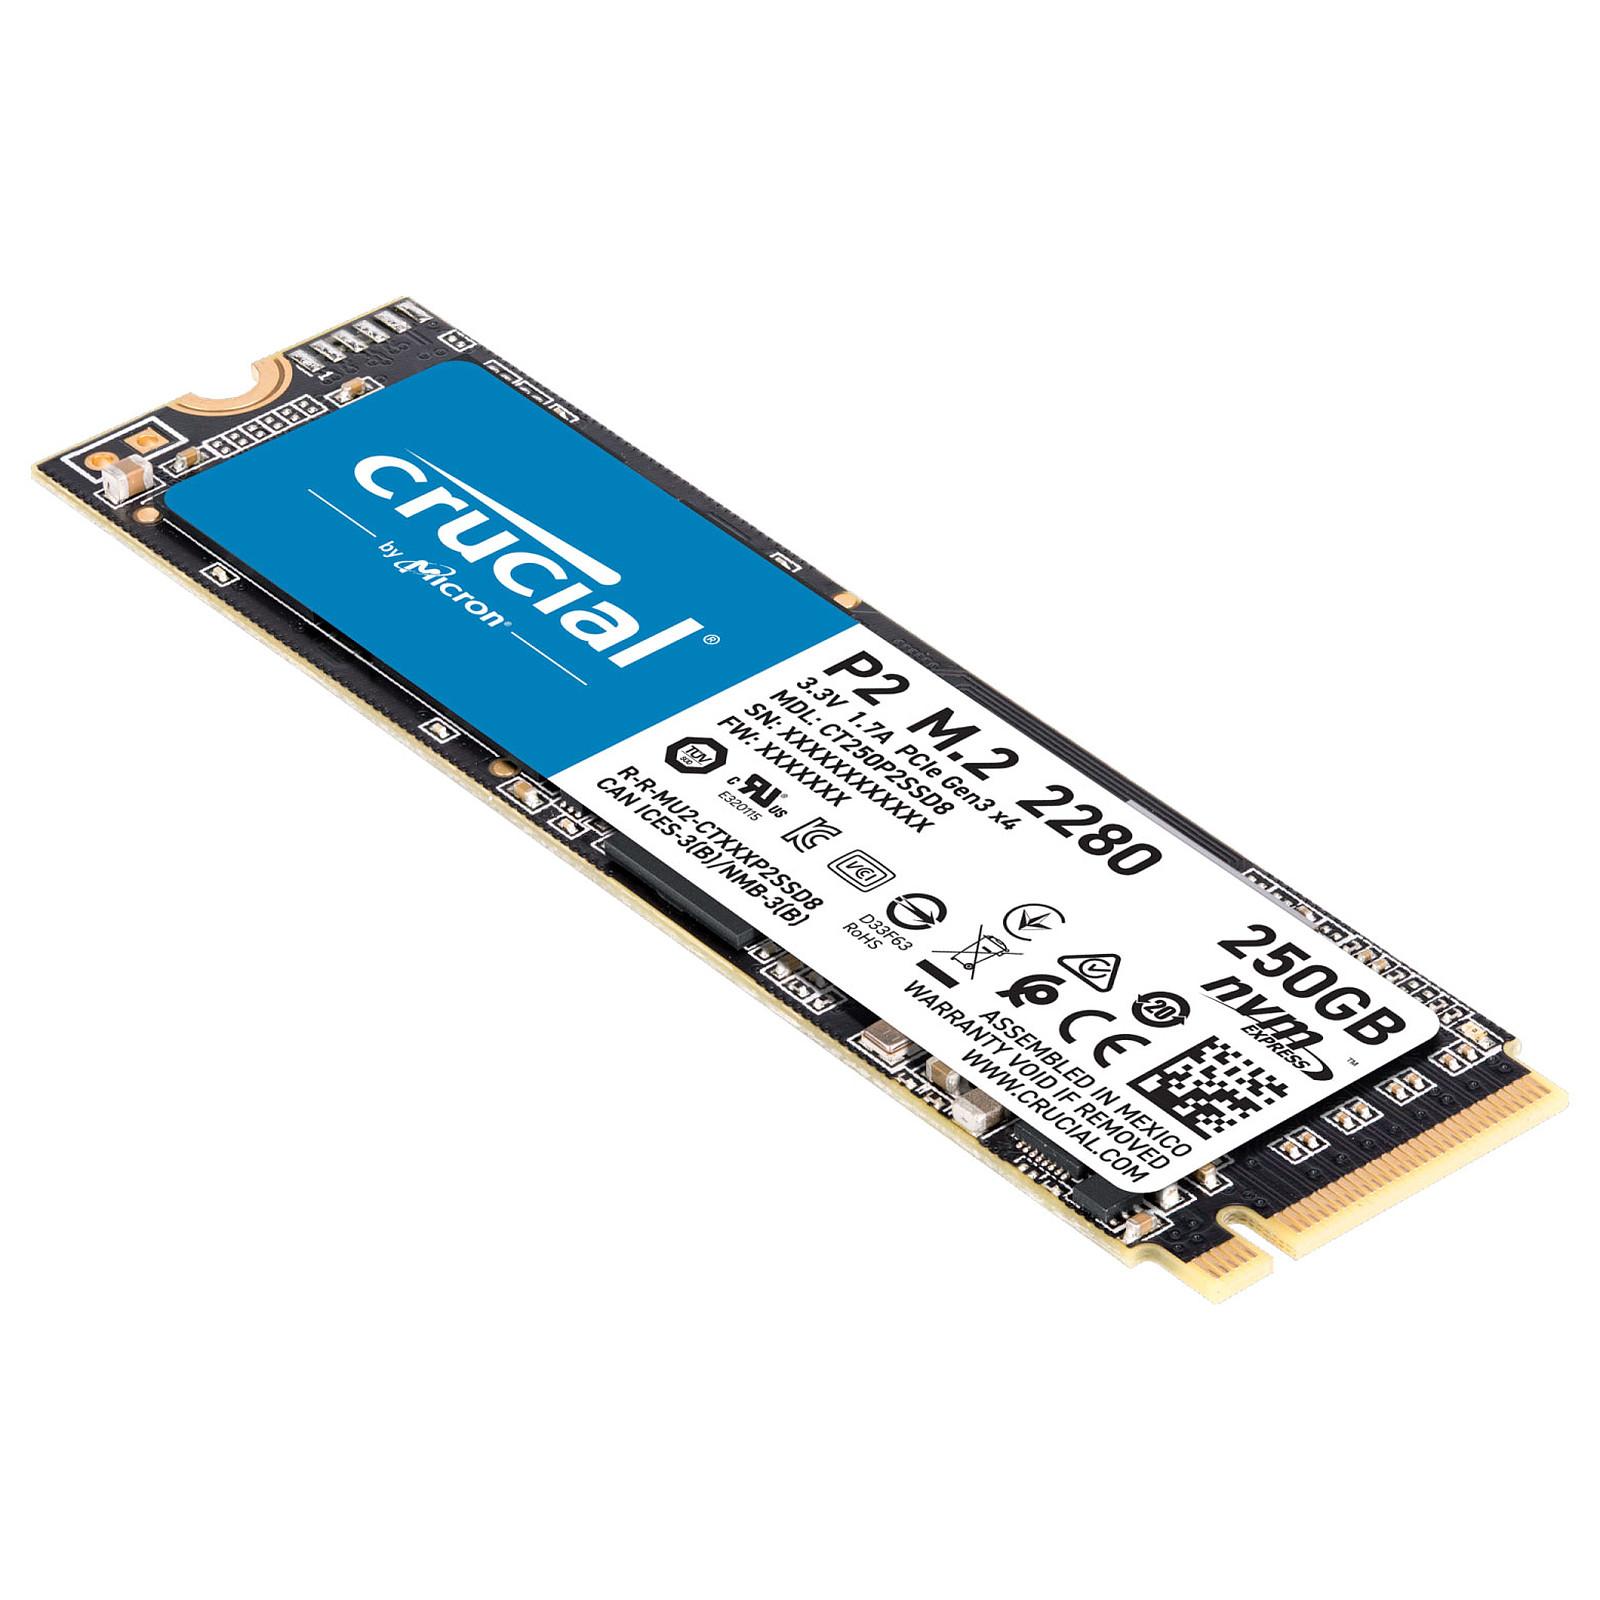 Crucial P2 240-275Go M.2 - Disque SSD Crucial - Cybertek.fr - 3